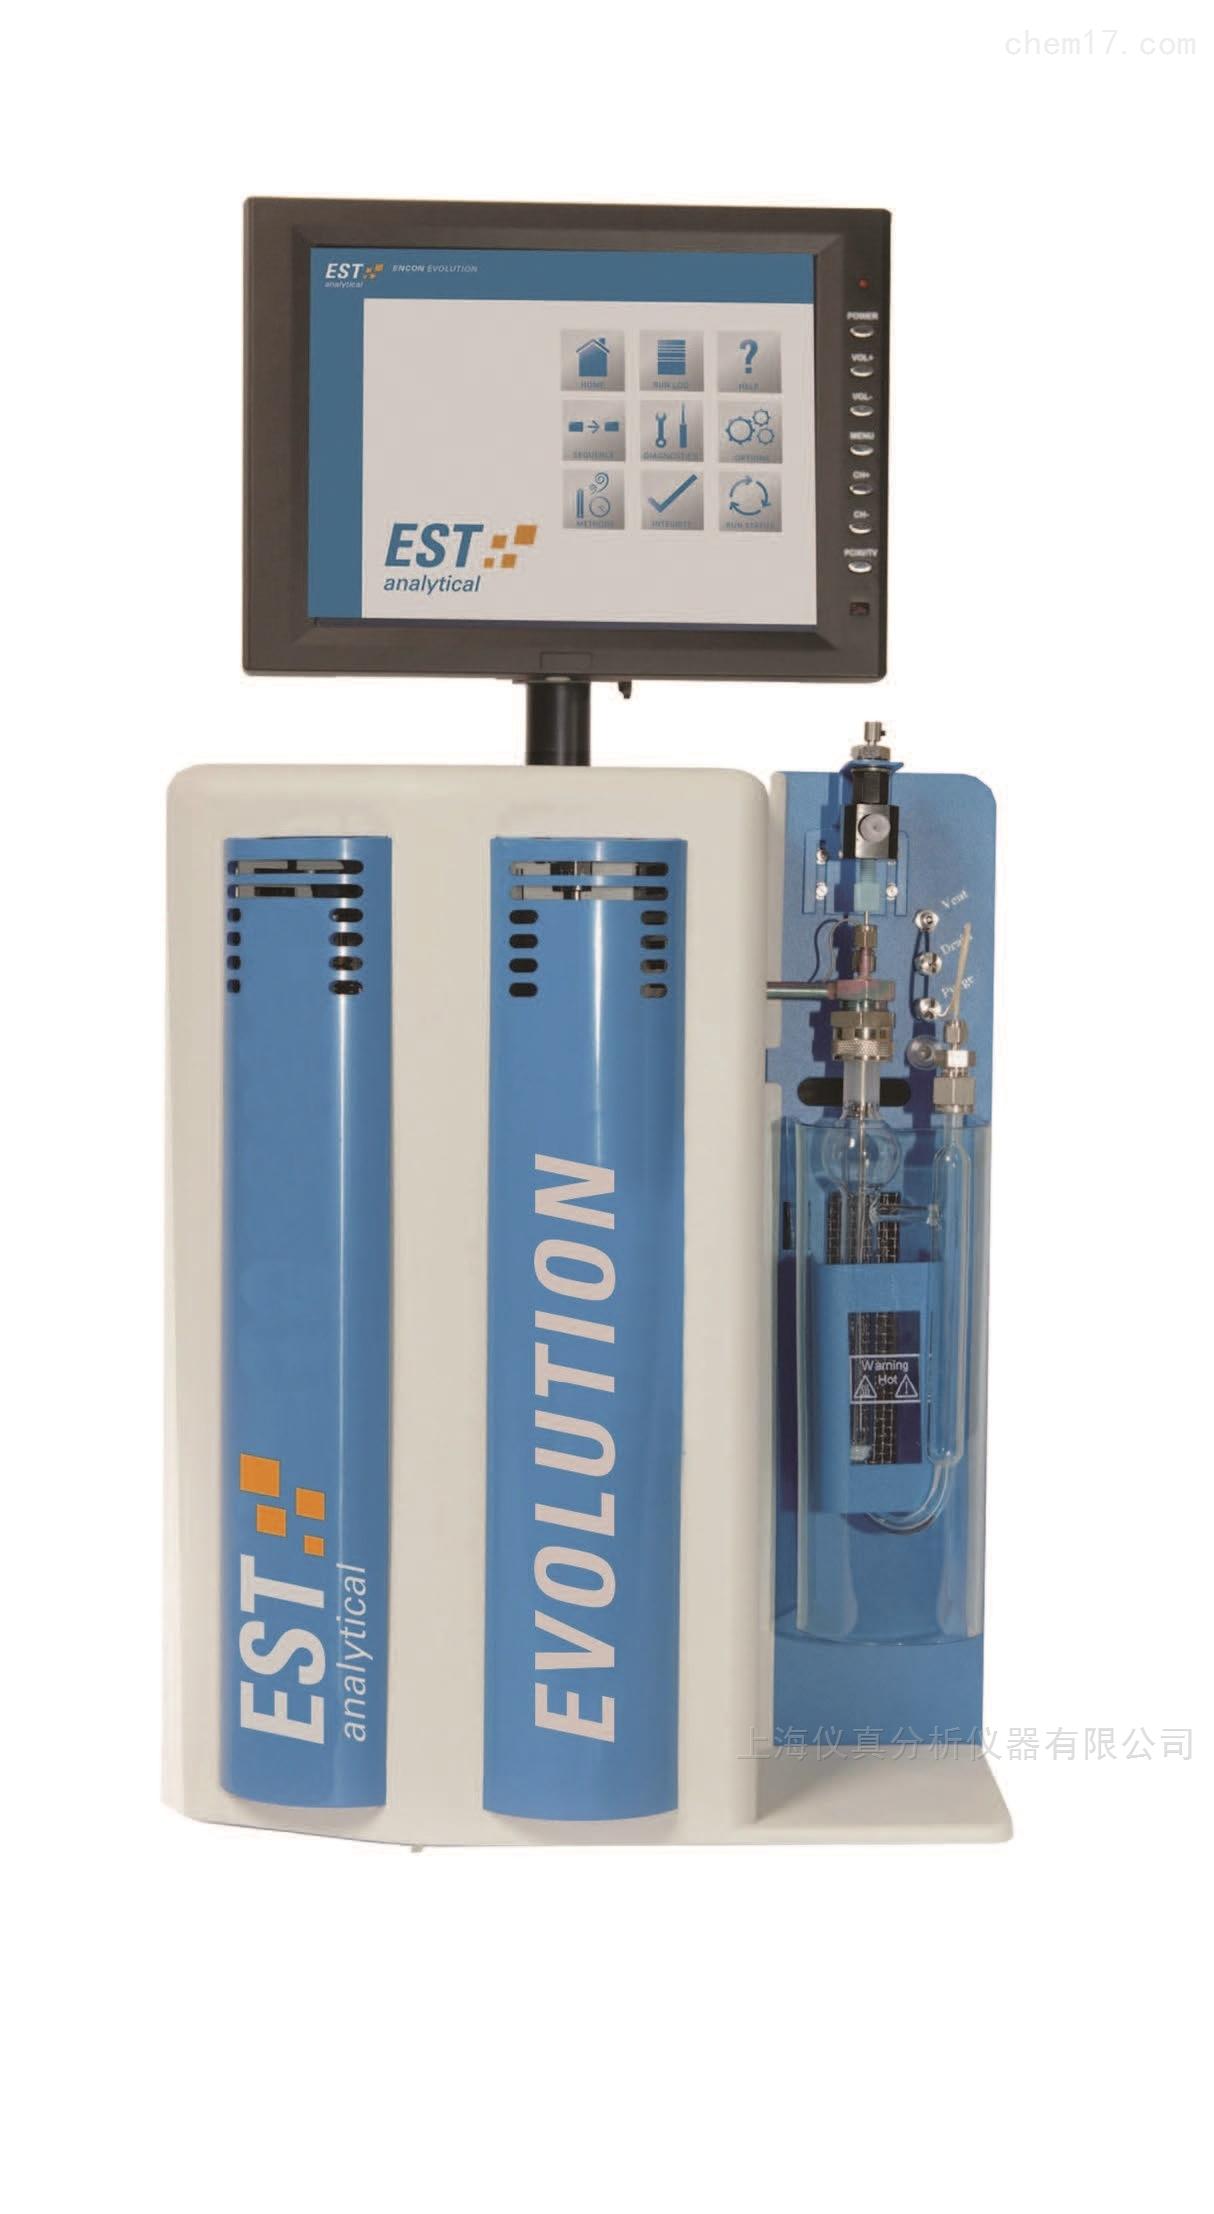 EST Evolution 吹扫捕集稀释仪 VOC